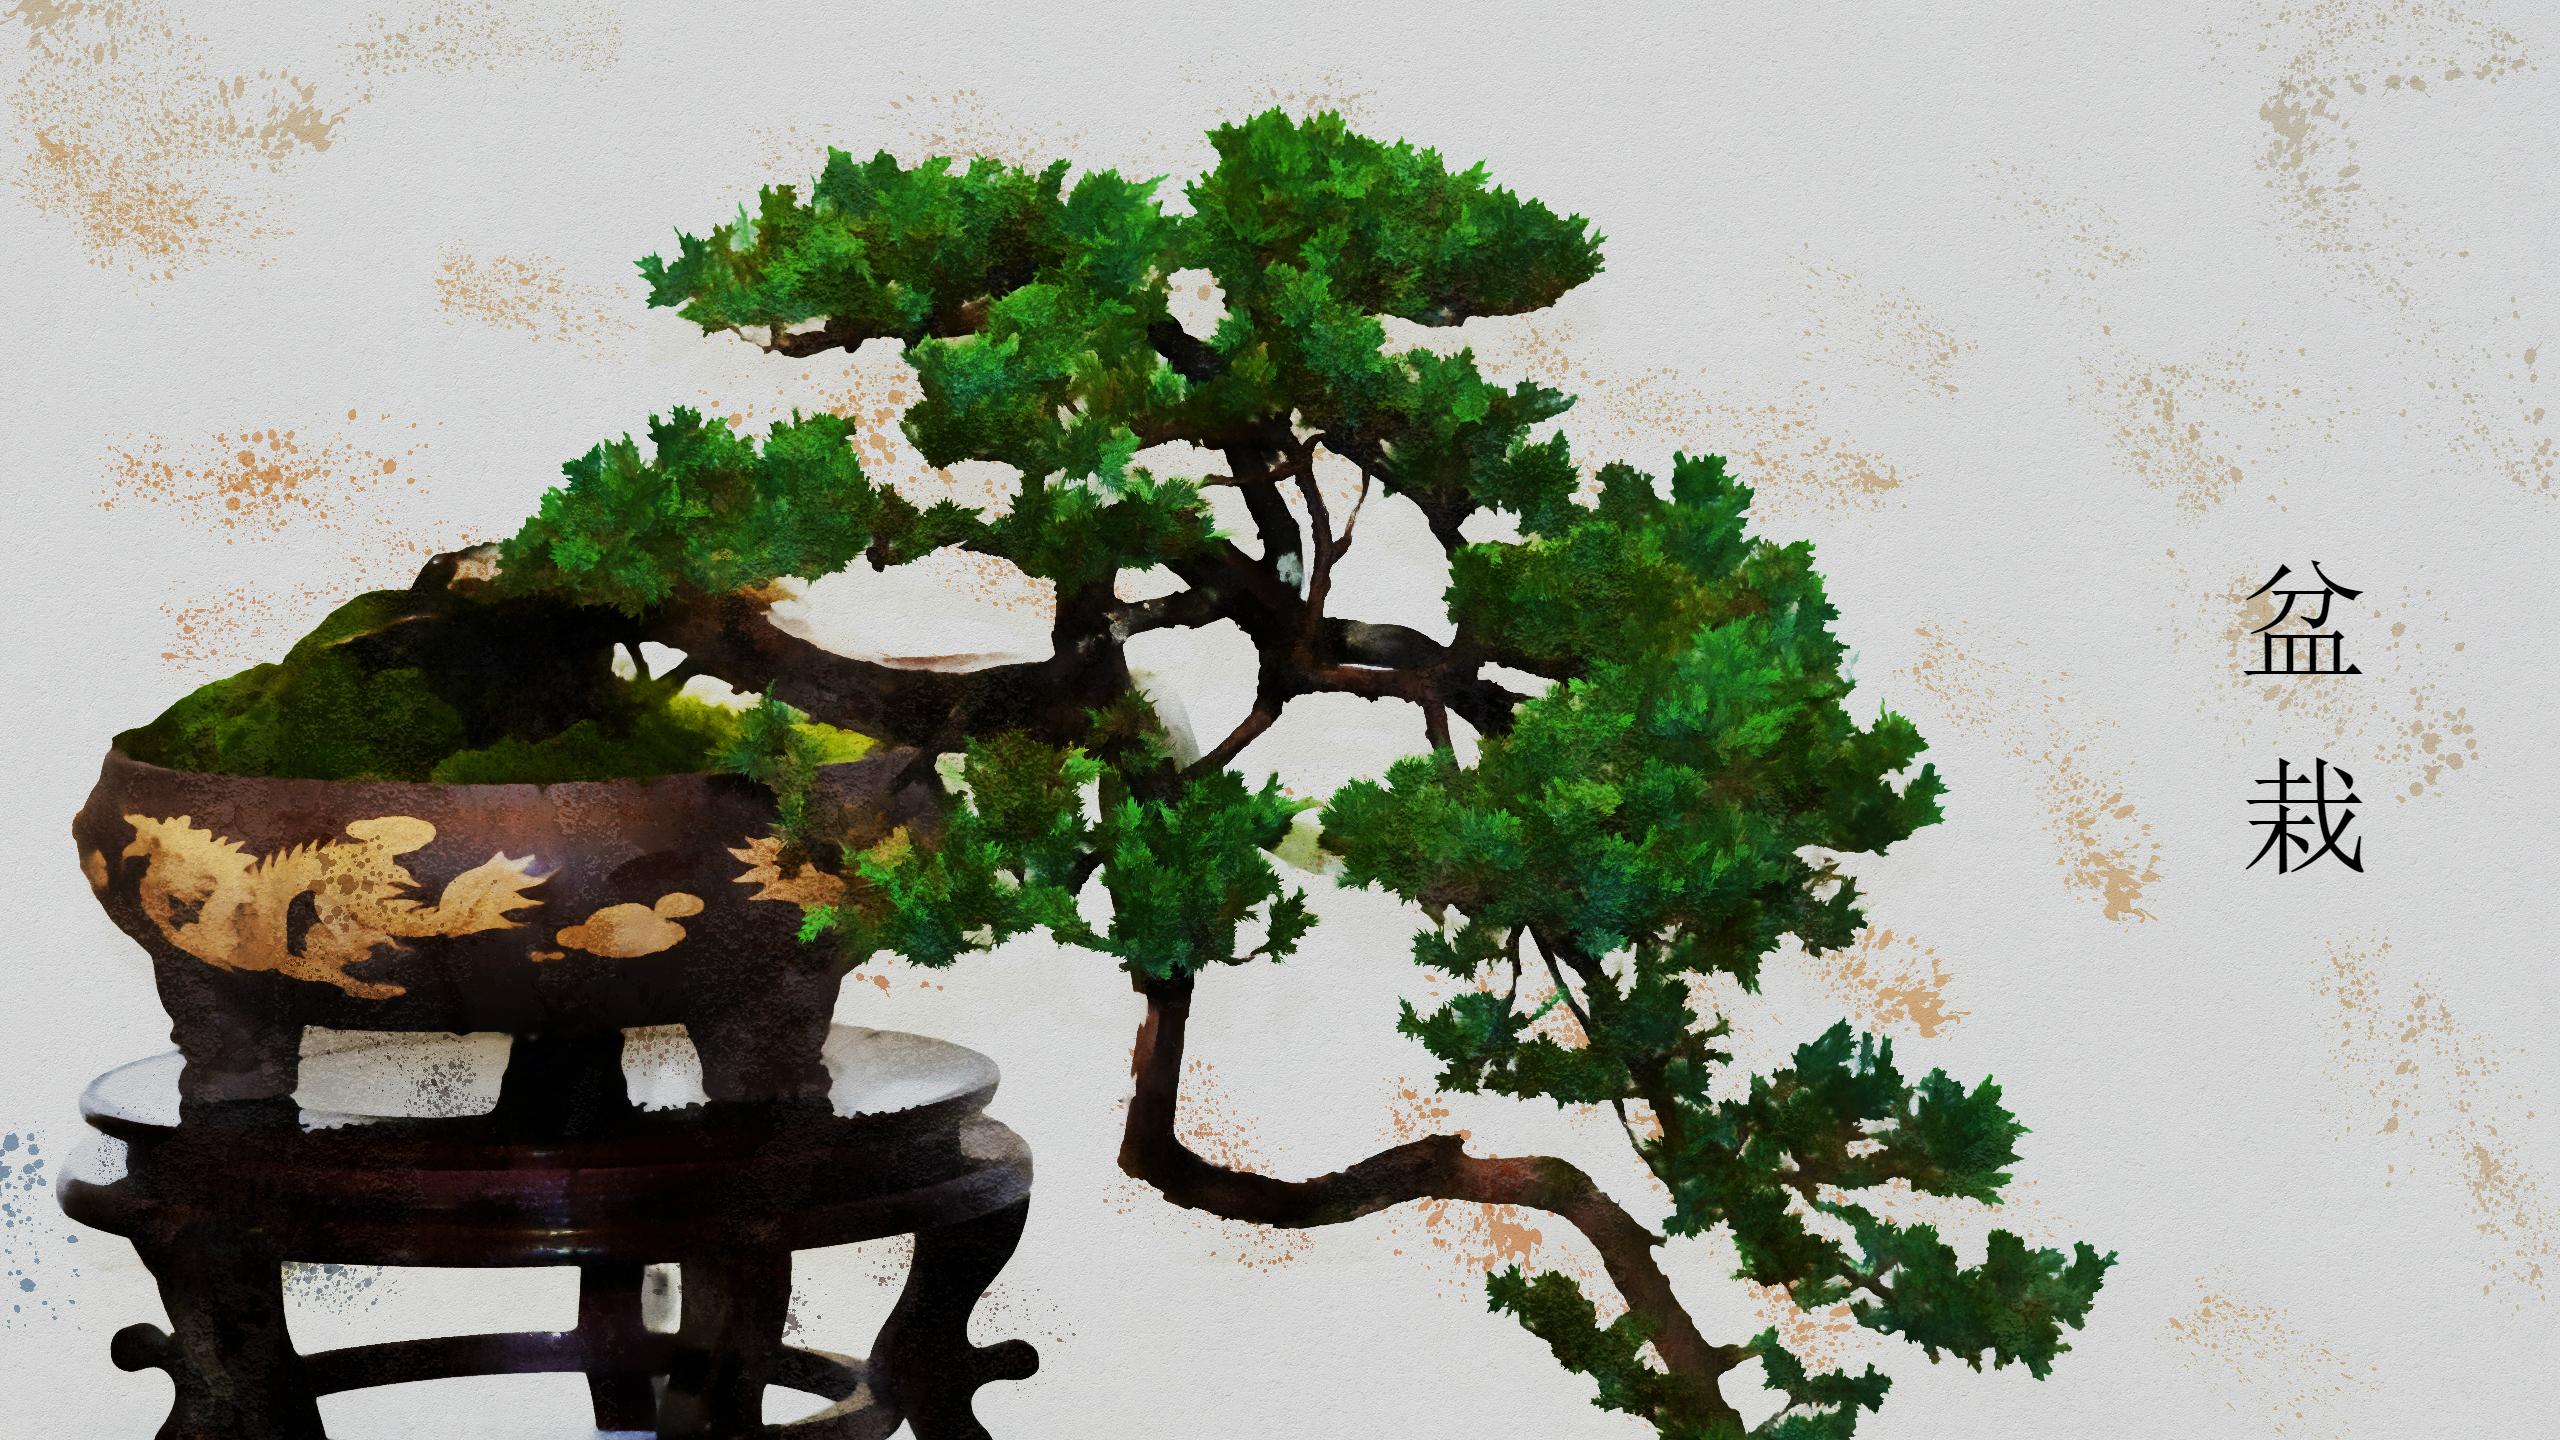 Artistic Bonsai Tree, with Bonsai in Japanese HD Wallpaper ...